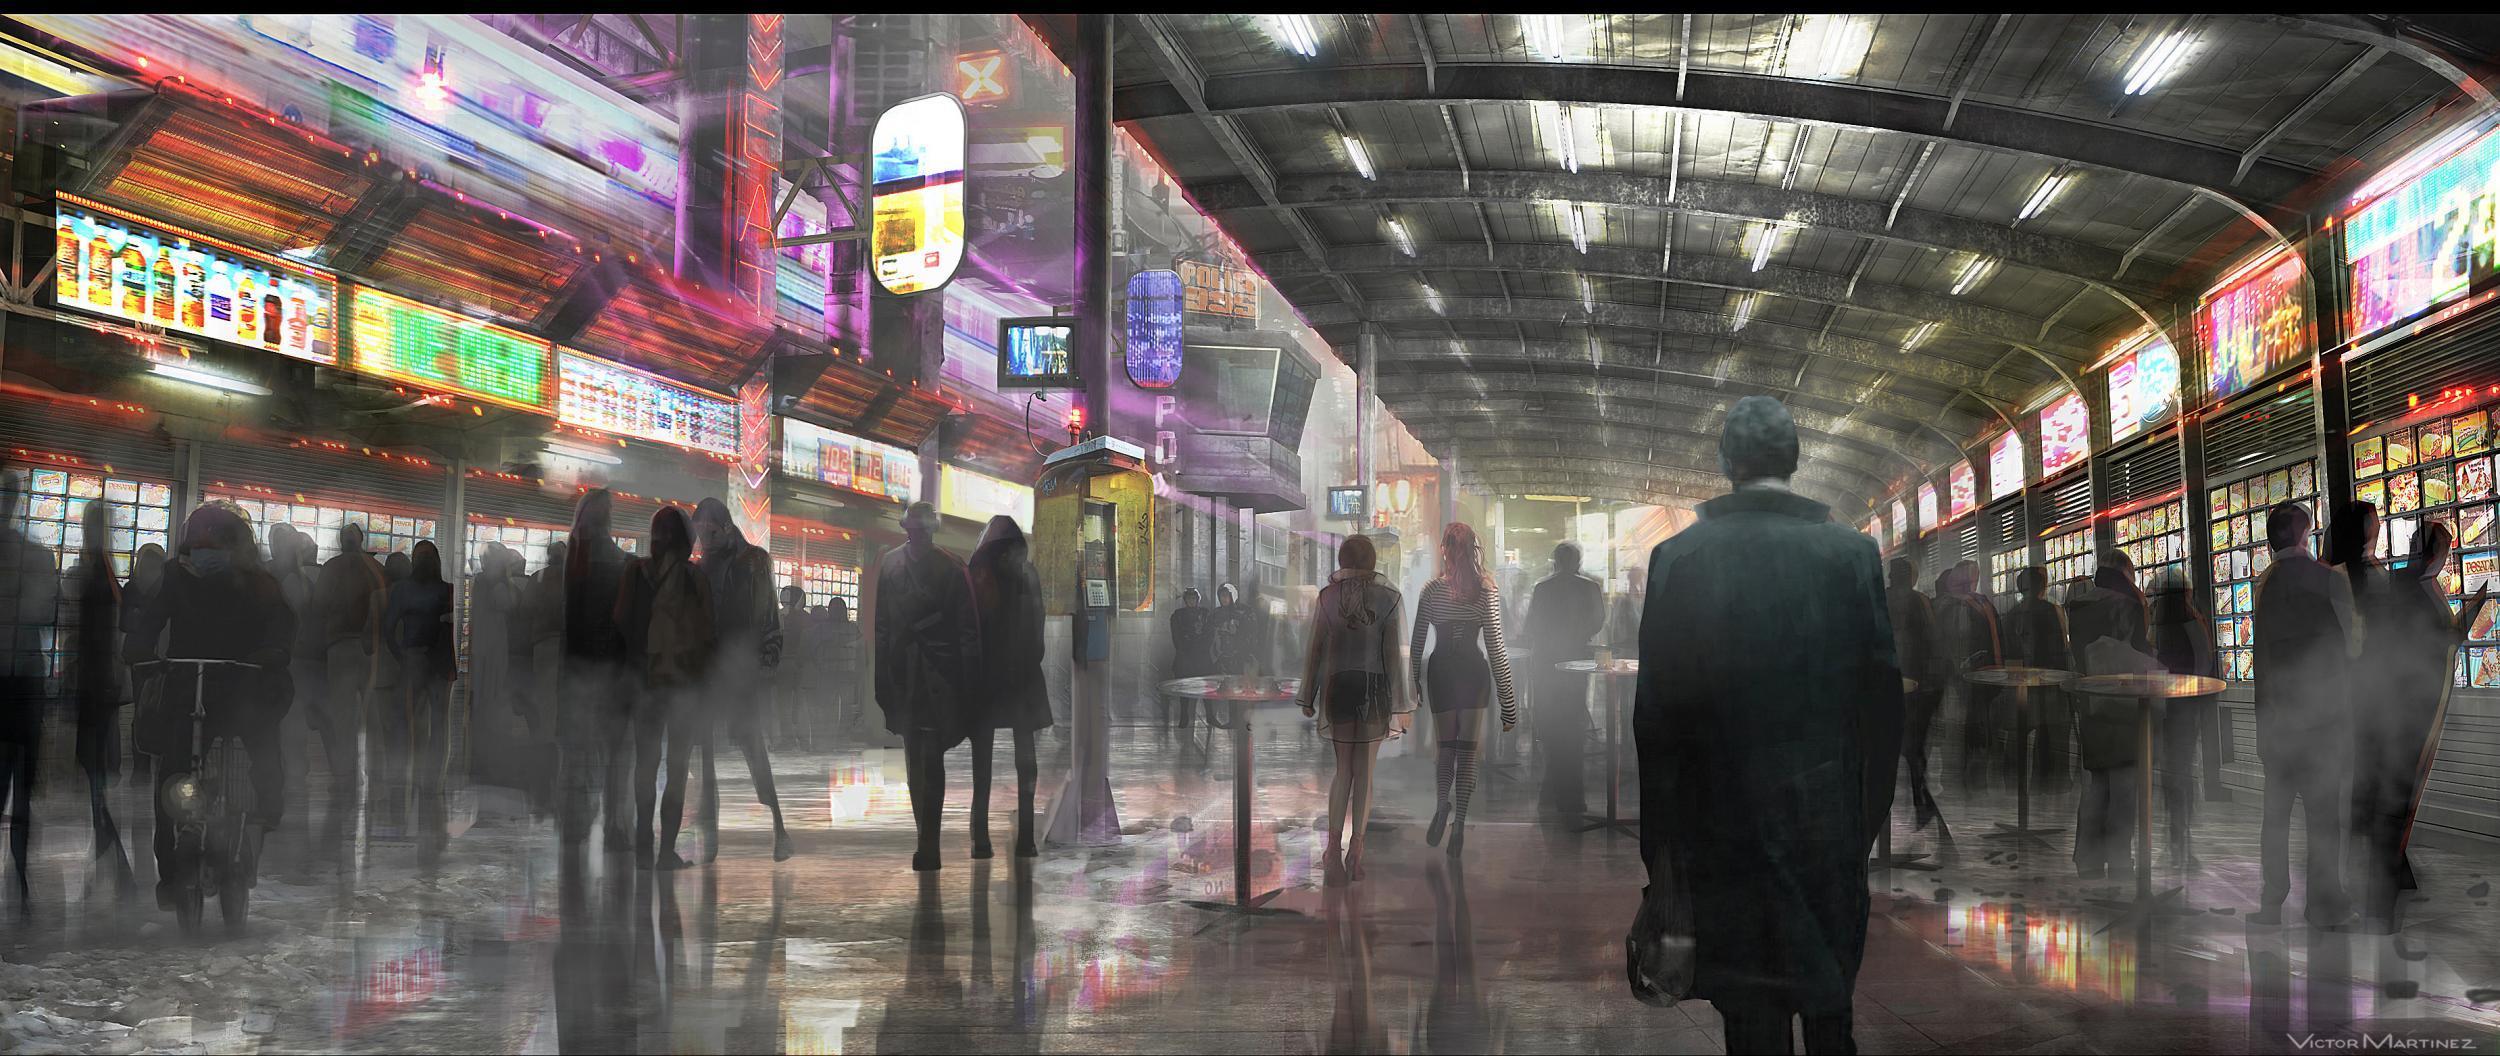 Blade Runner 2: First gloomy image released for long-awaited sequel